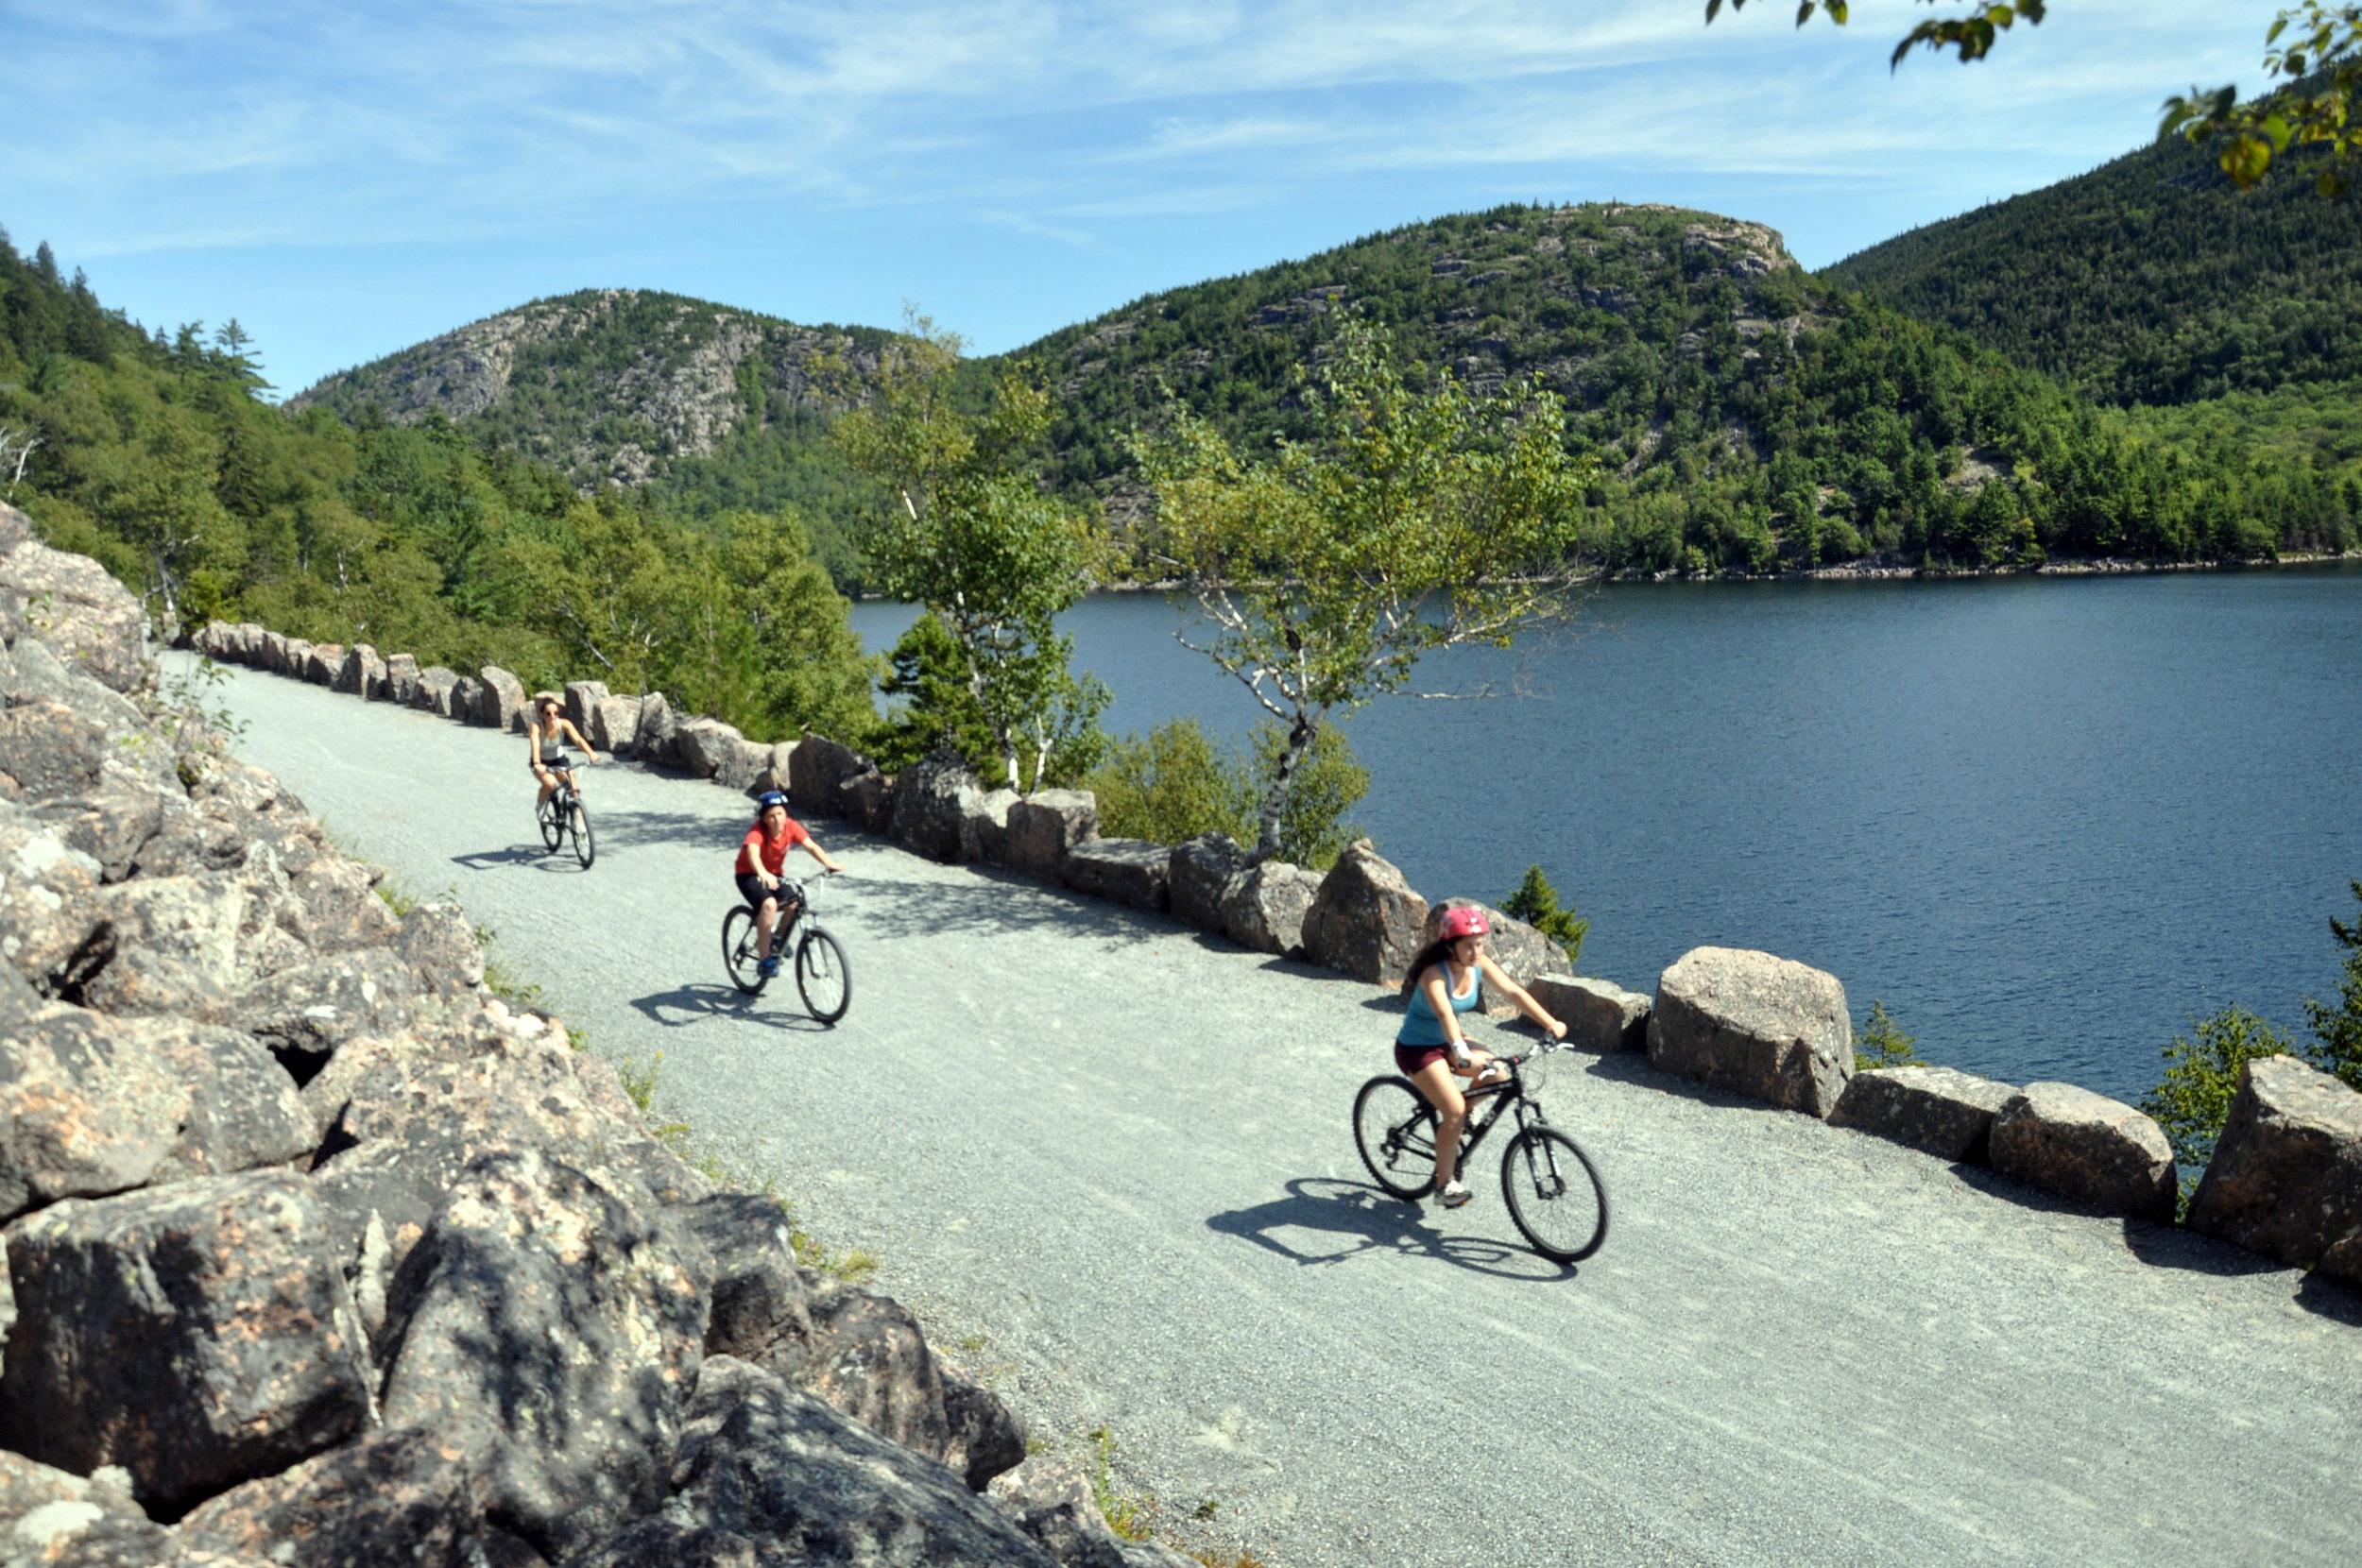 Biking the carriage roads. Image from Acadia Bike; acadiabike.com.